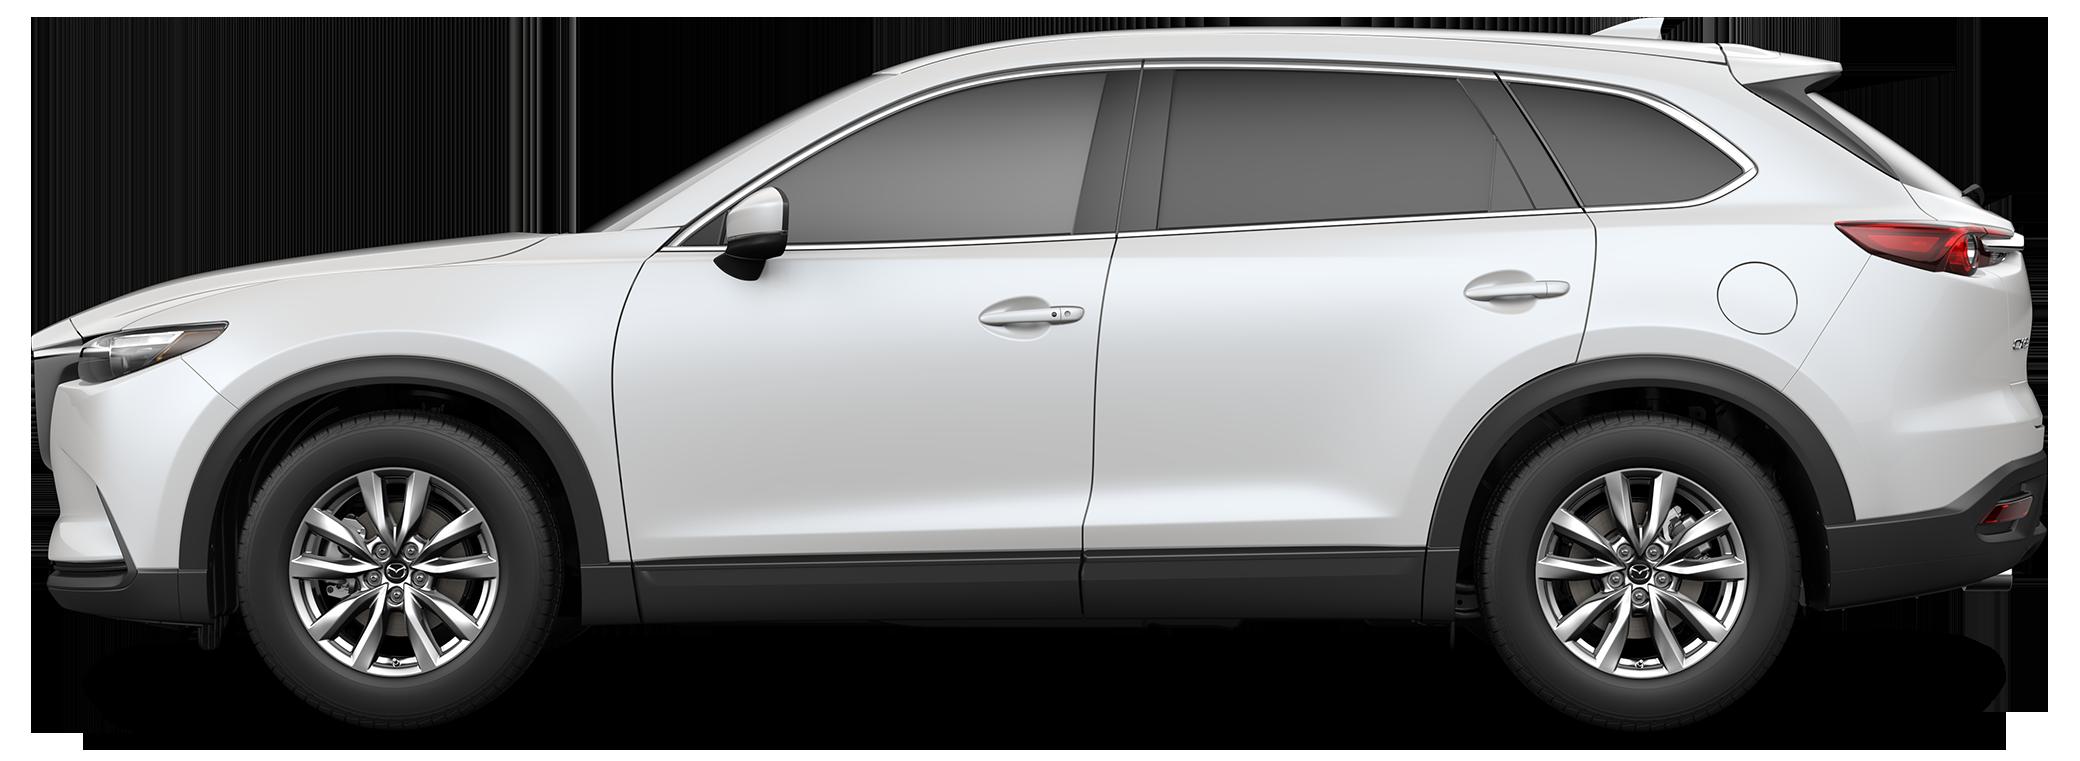 2019 Mazda Mazda CX-9 SUV Touring